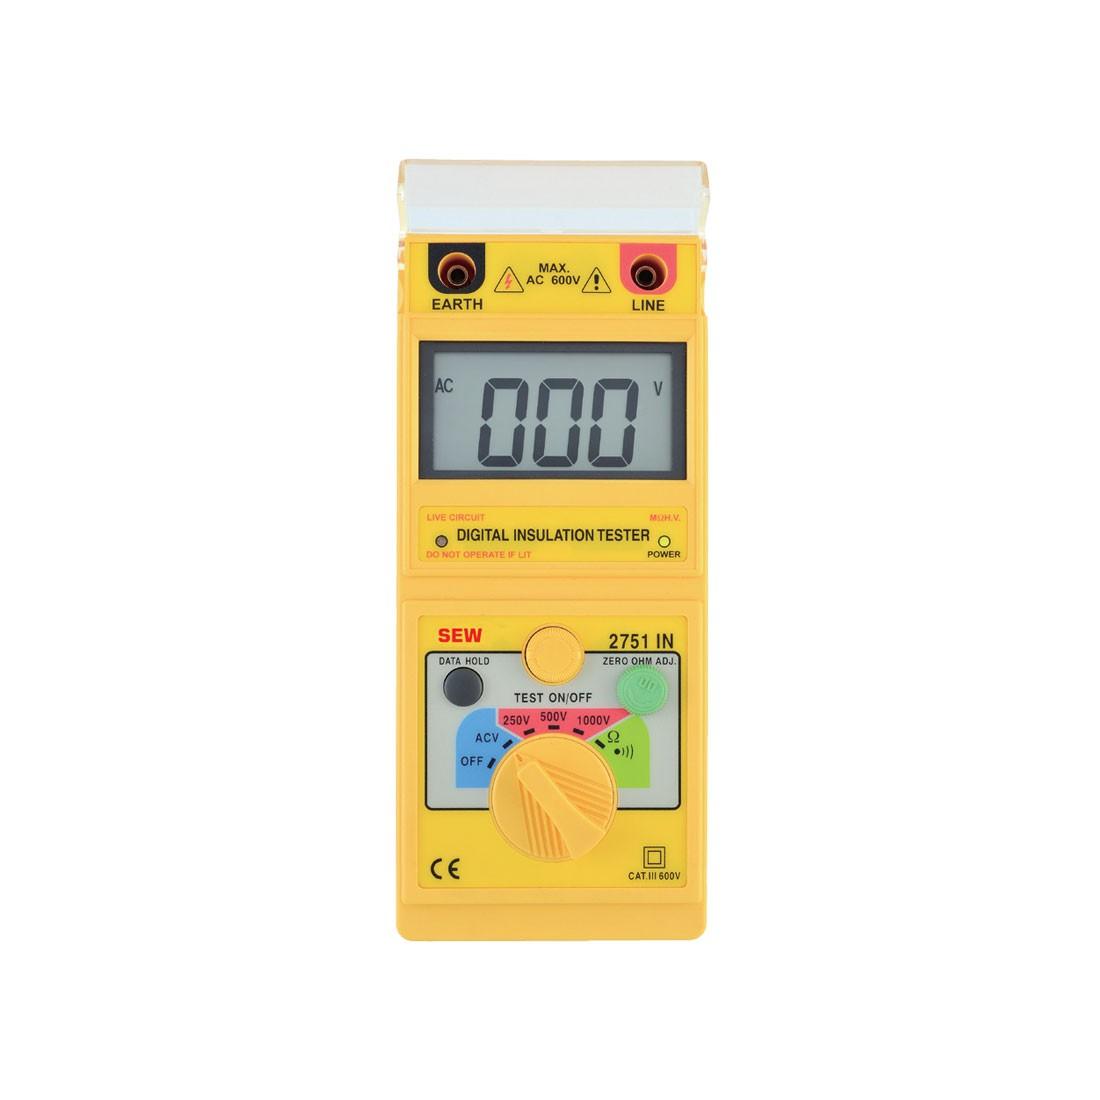 2751IN Digital (Up to 1kV) Insulation Tester